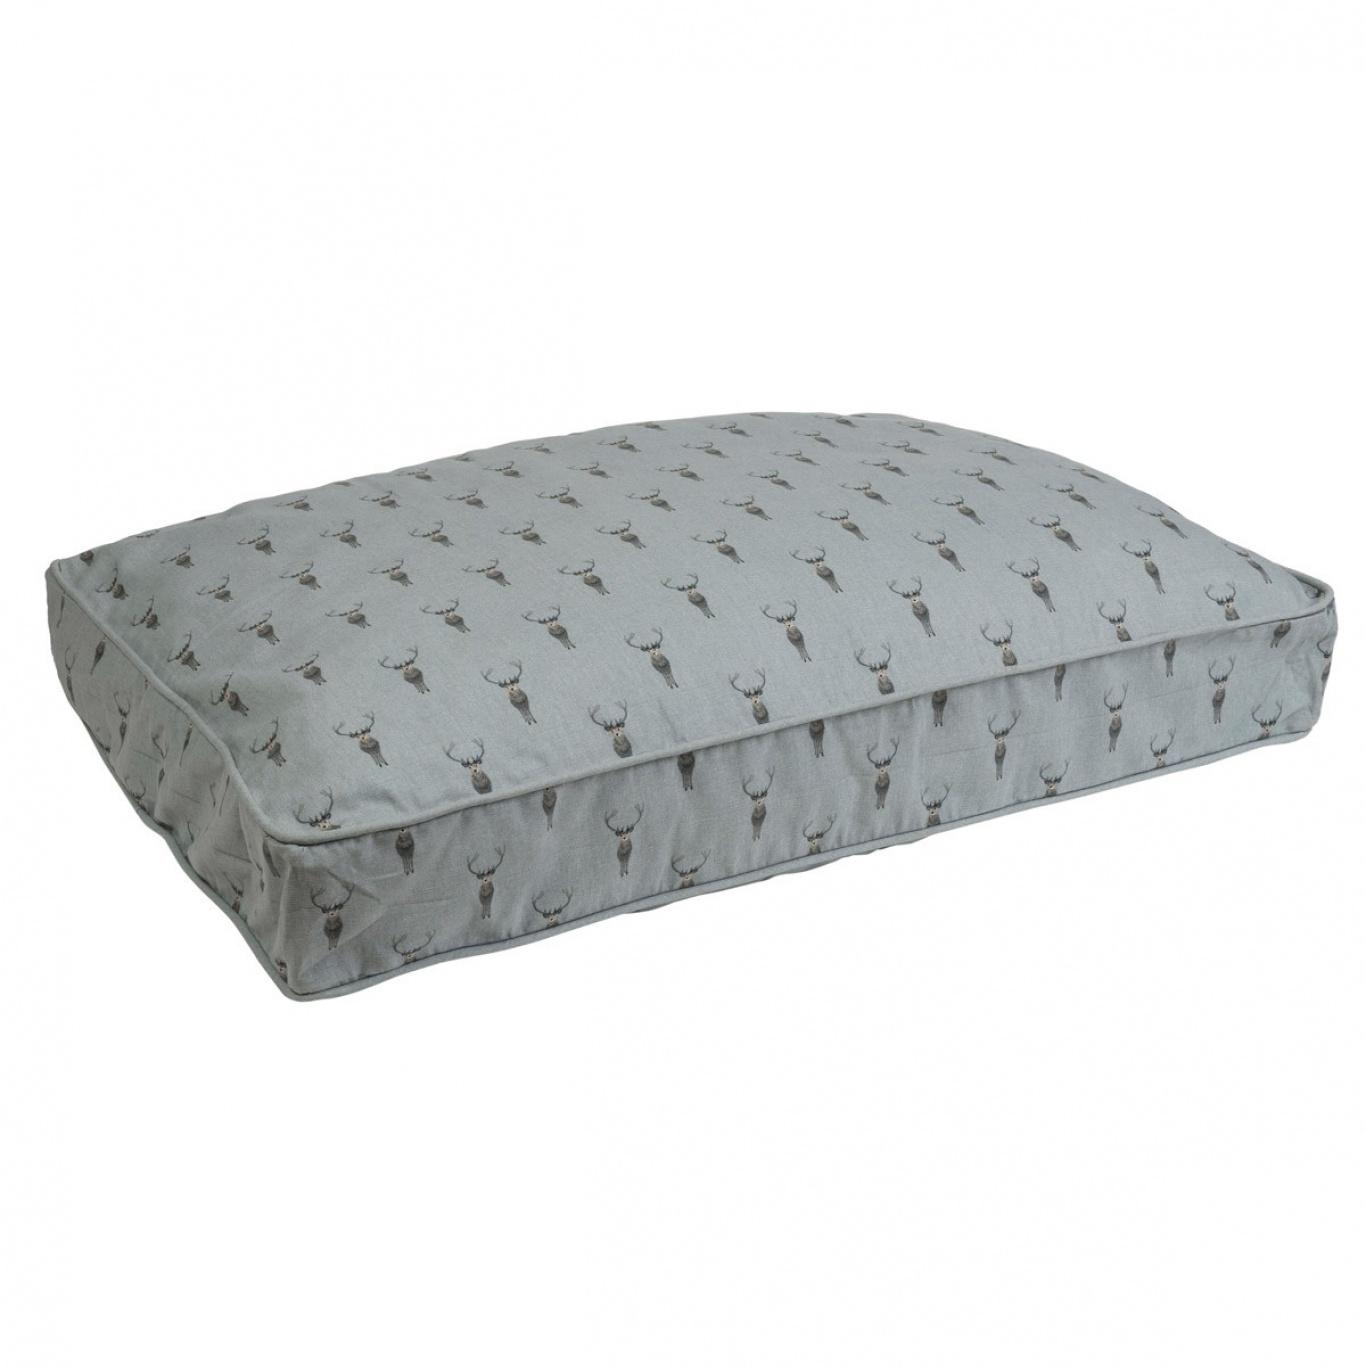 Image of Sophie Allport Highland Stag Medium Pet Bed Mattress